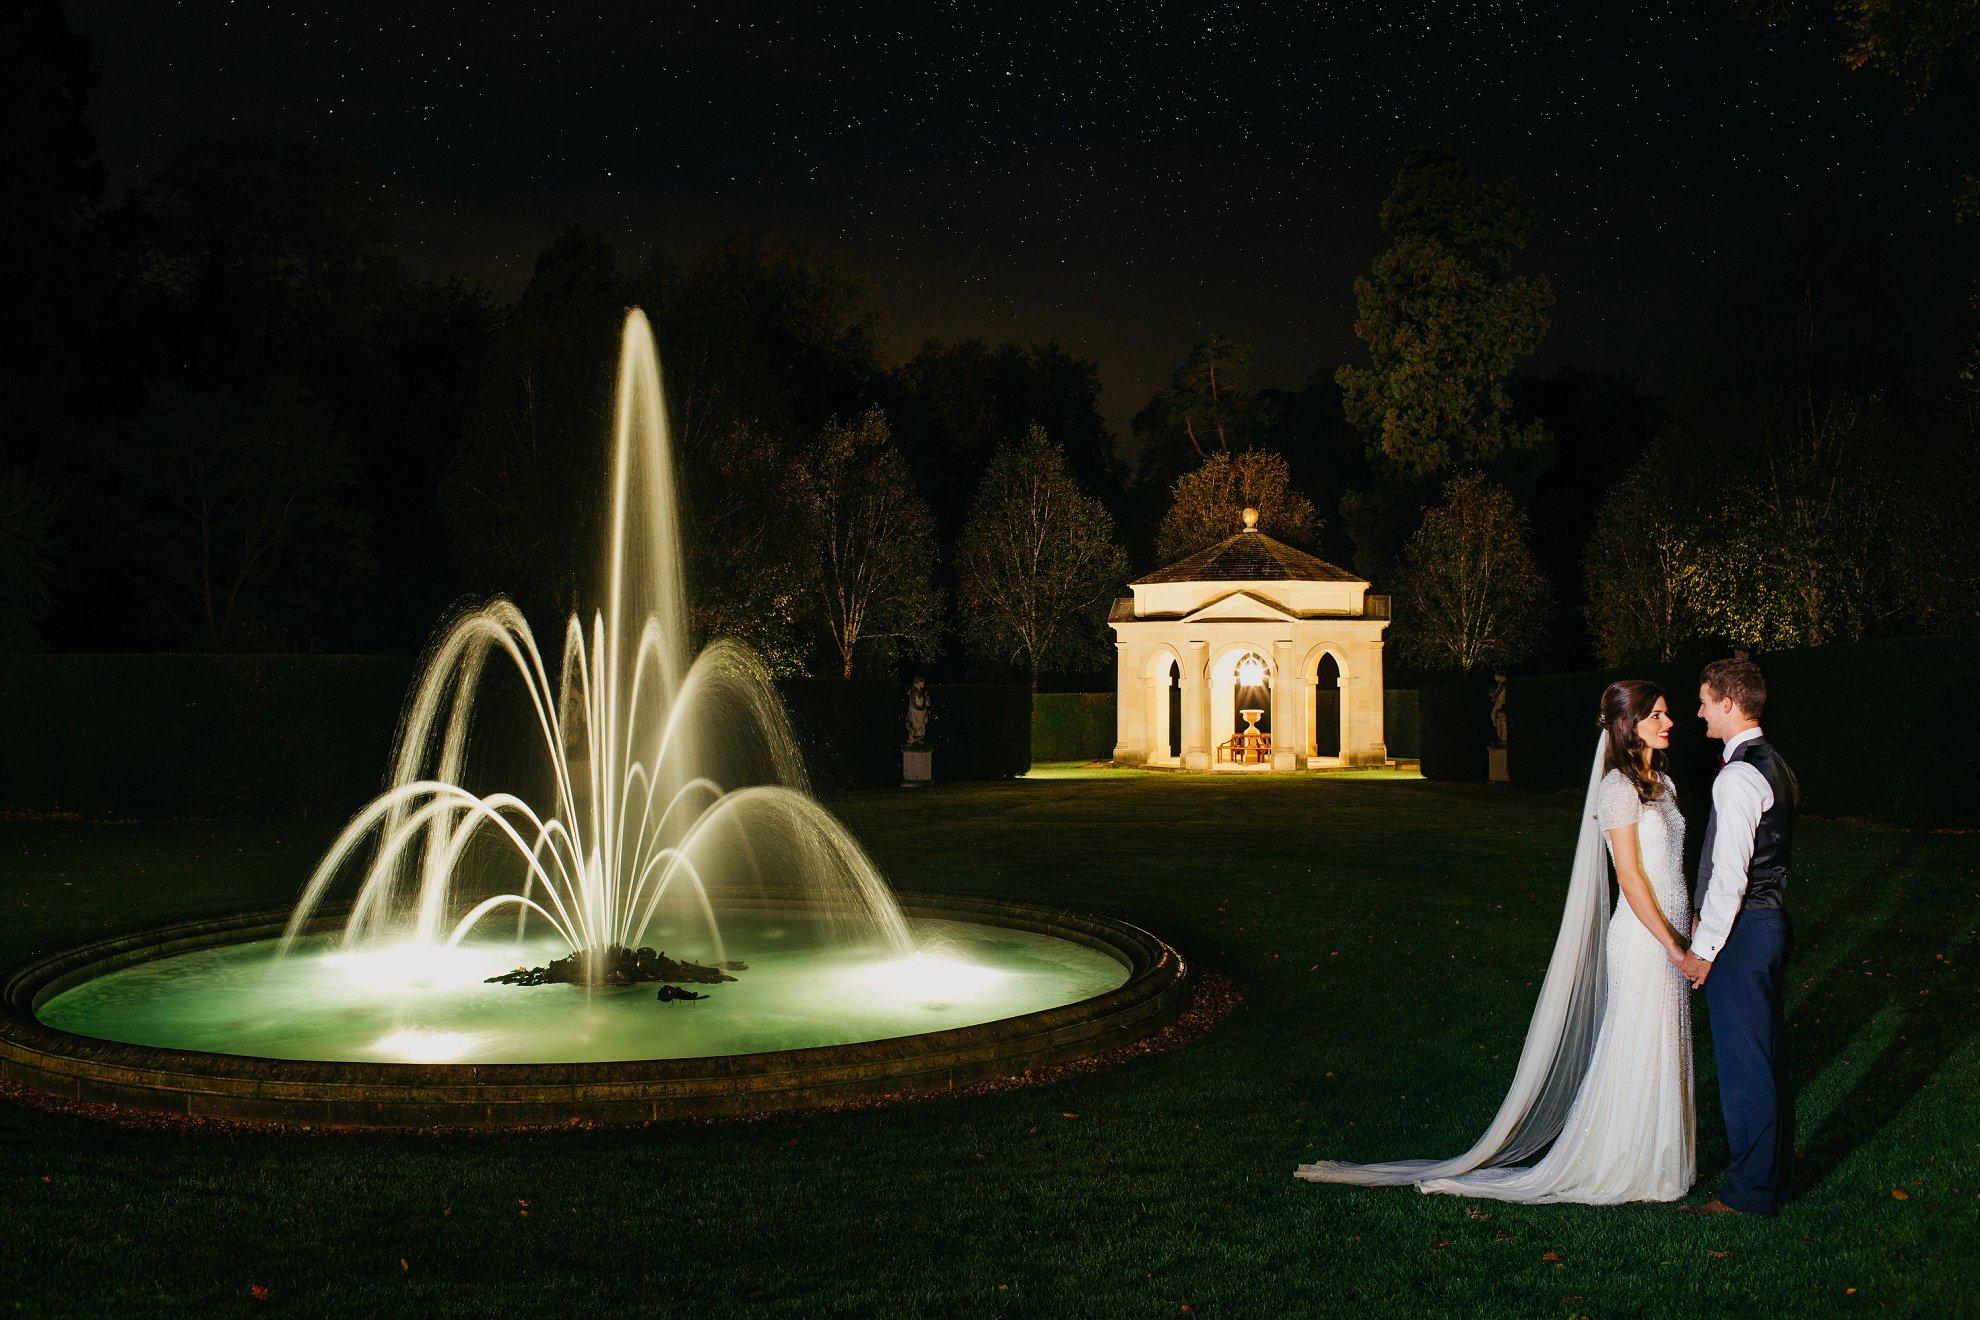 settrington wedding photographer